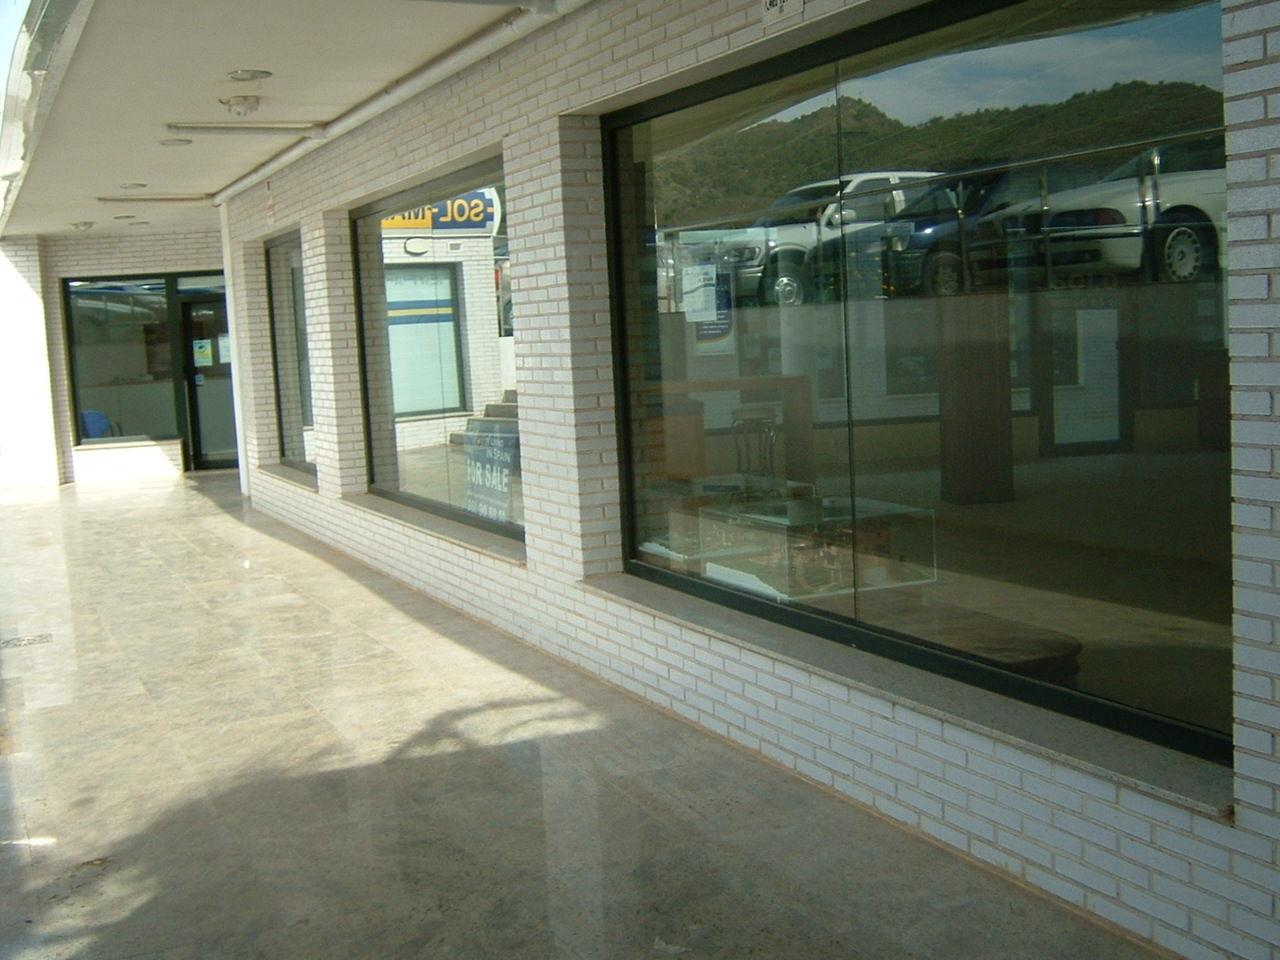 Centro comercial, La Manga Club (verde pino)